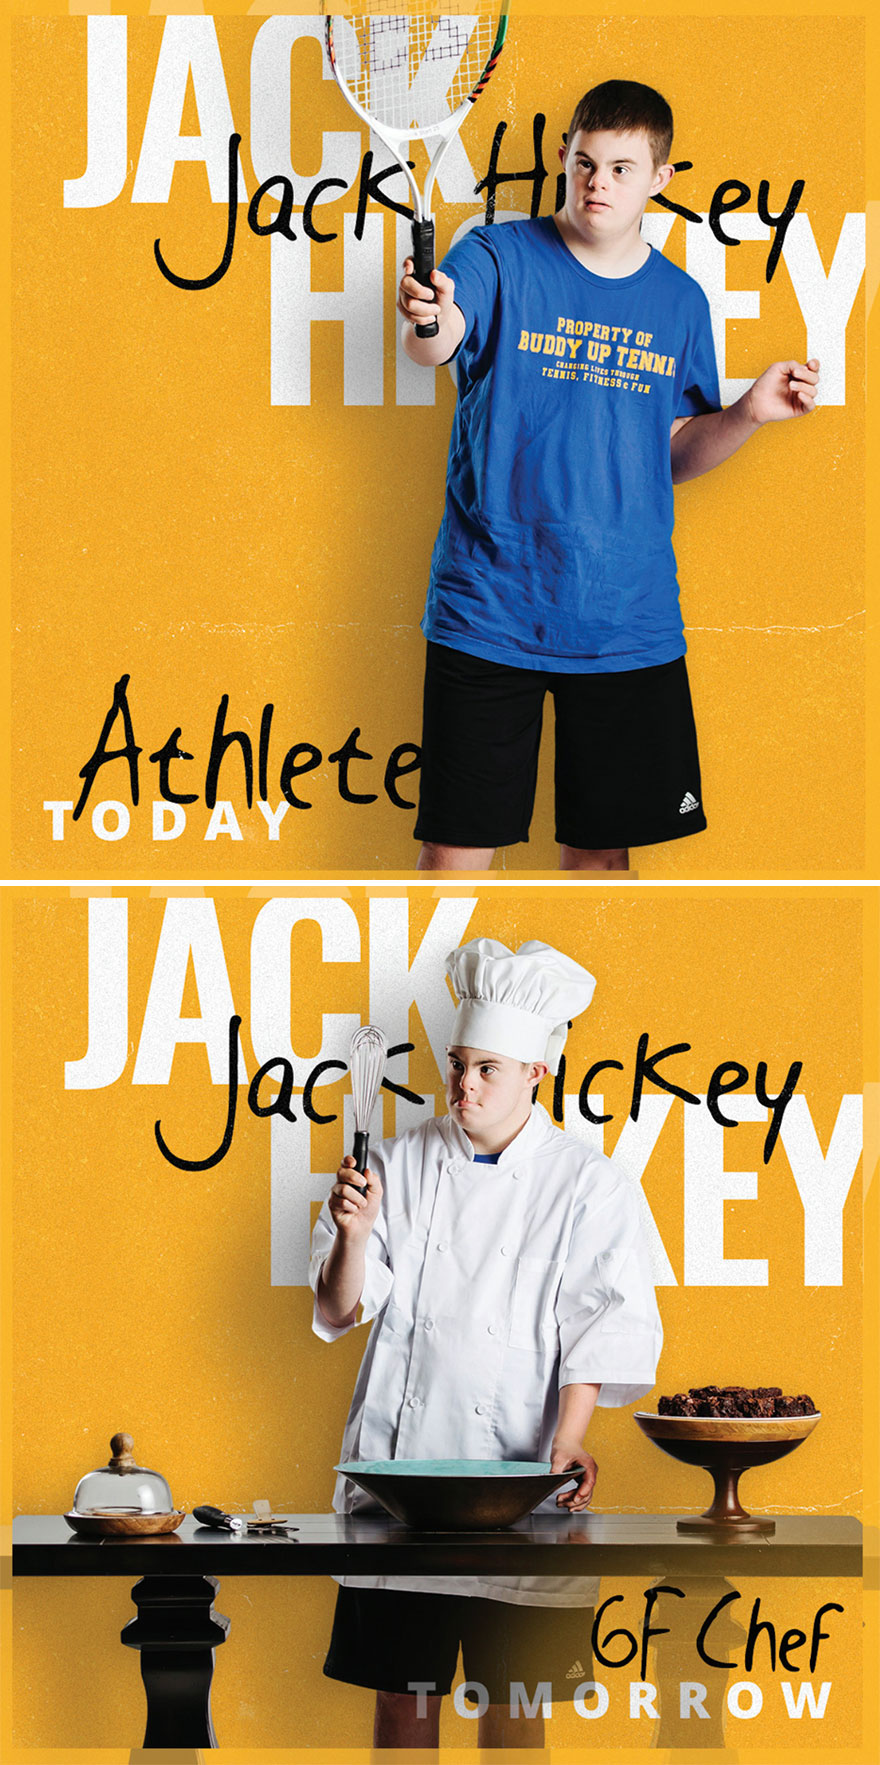 Jack Hickey, GF Chef